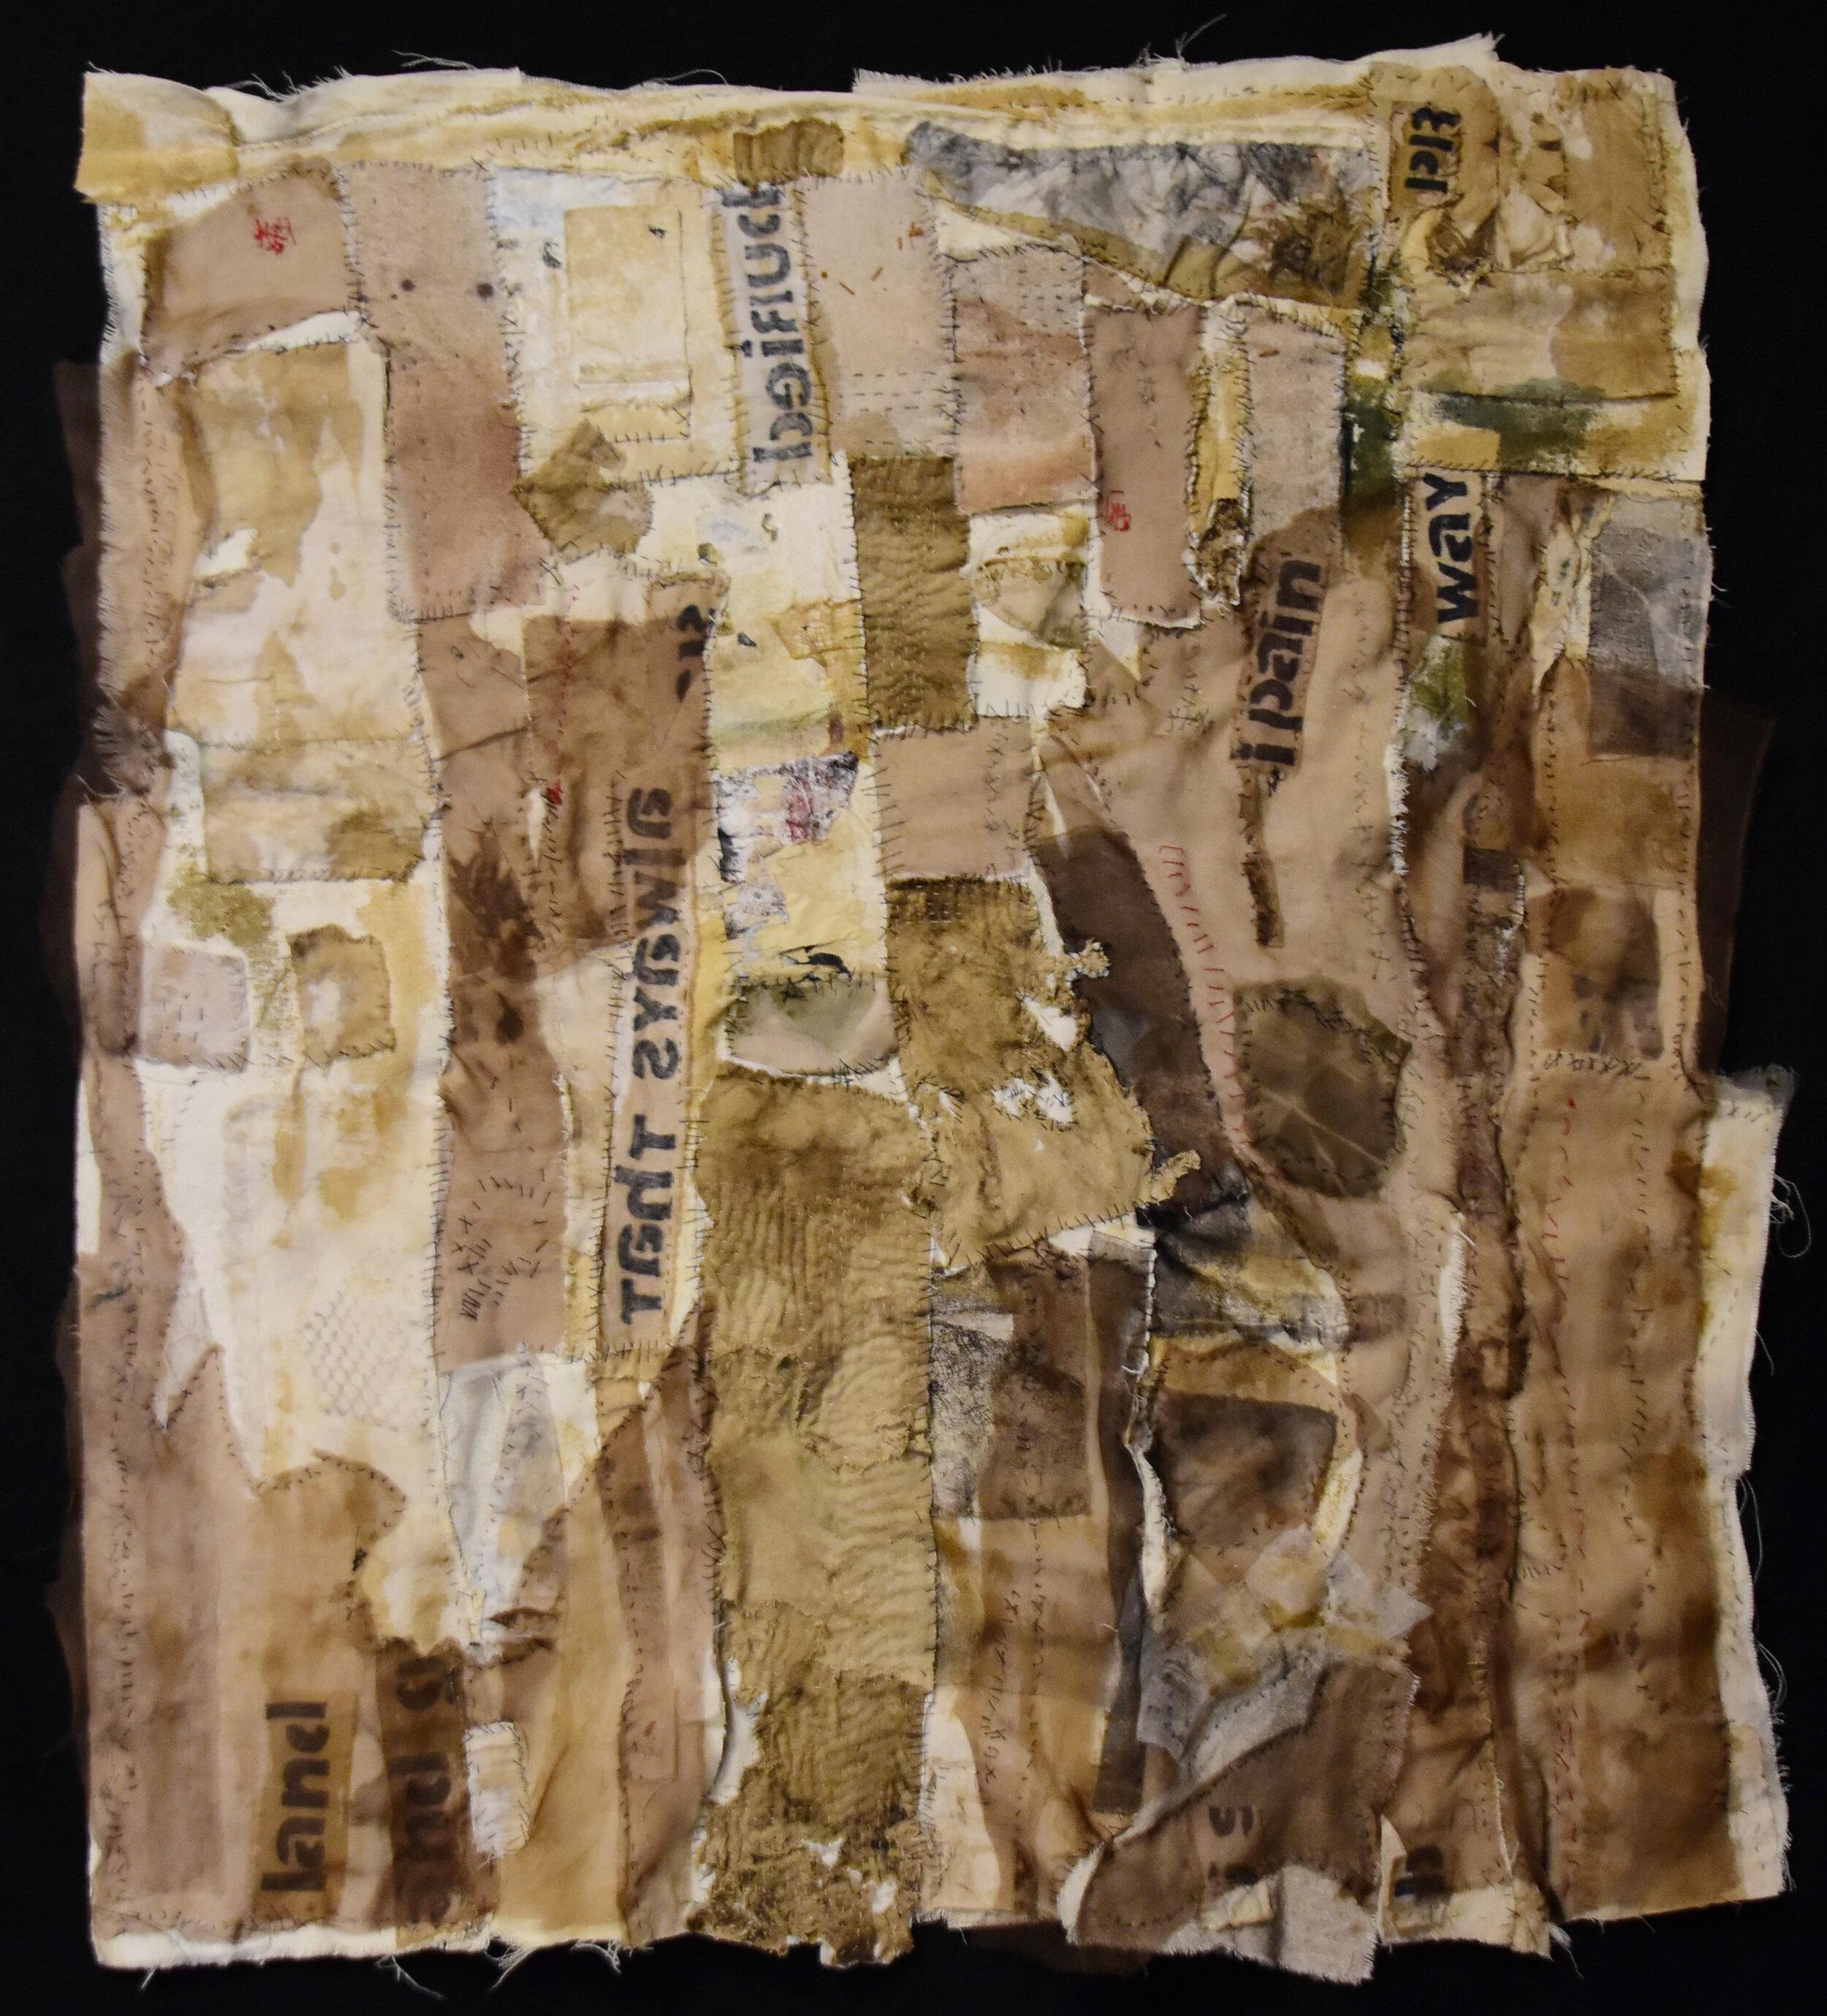 Erica Popp Studio + Gallery